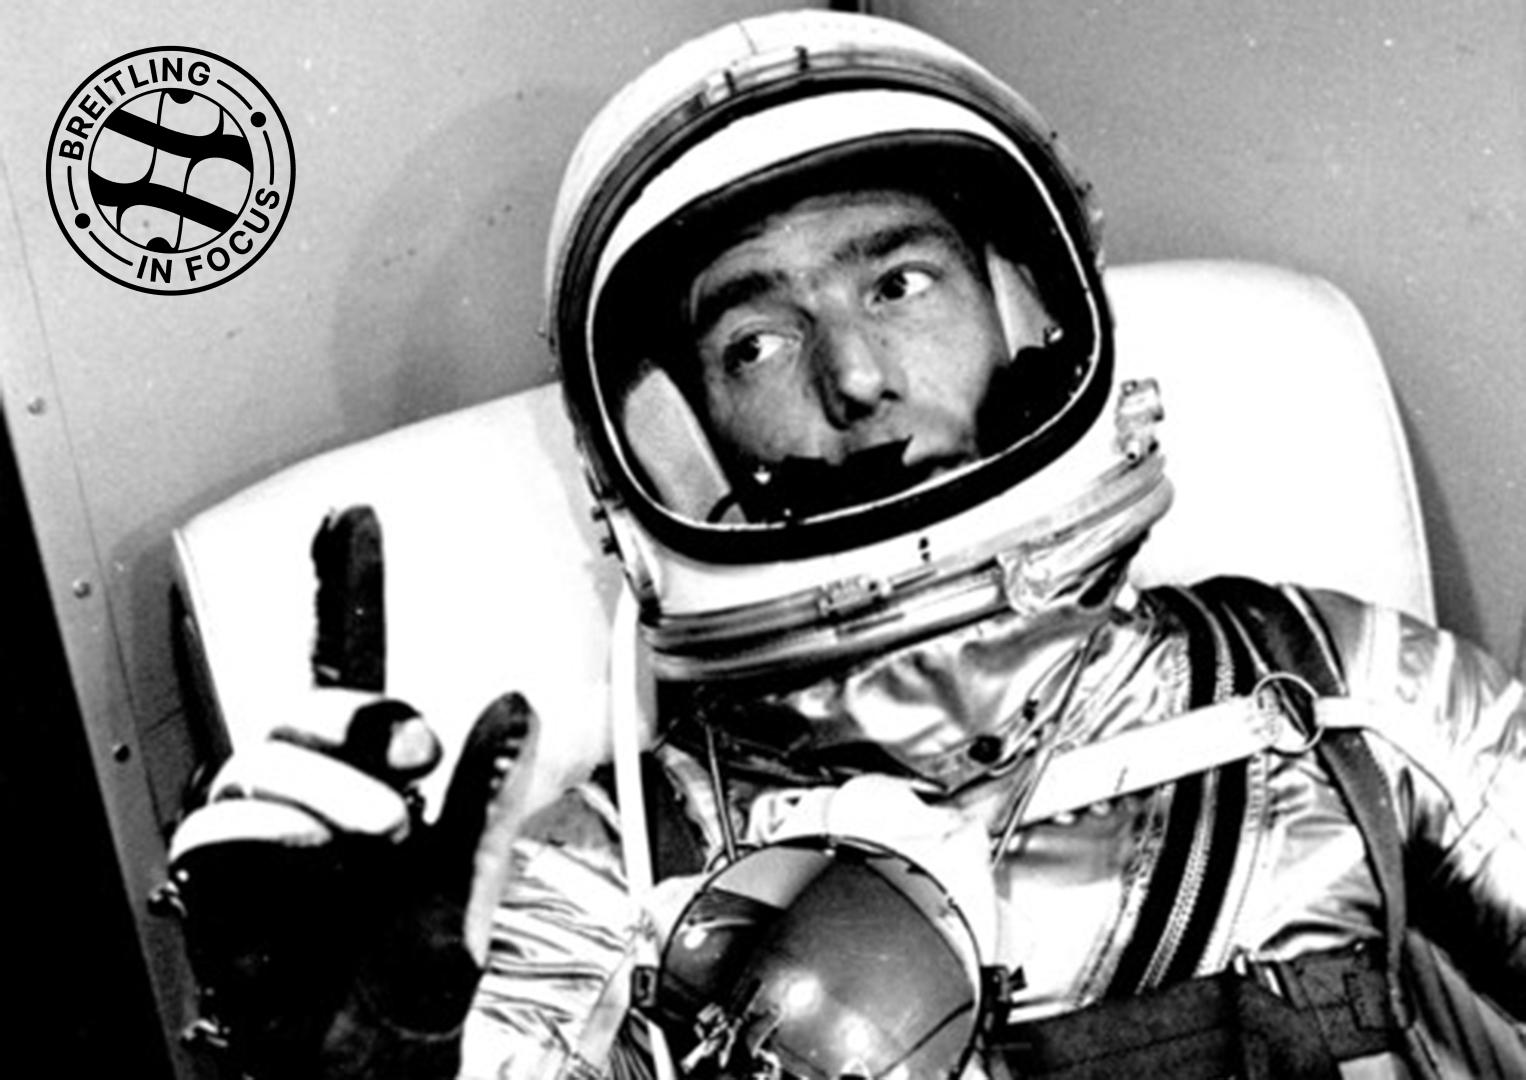 Pioneering NASA astronaut Scott Carpenter in Aurora 7